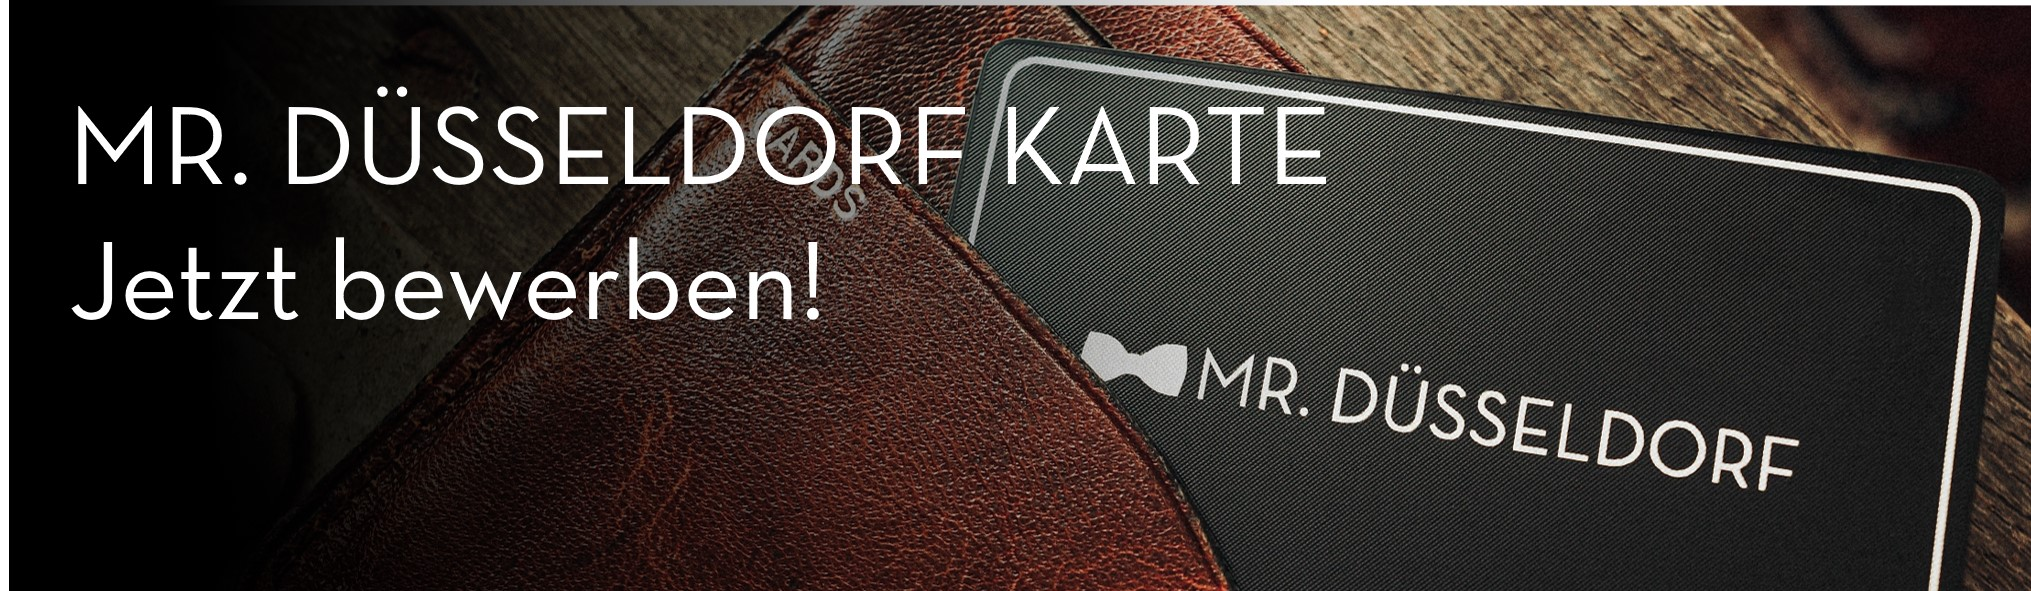 Mr. Düsseldorf | Mr. Düsseldorf Karte |